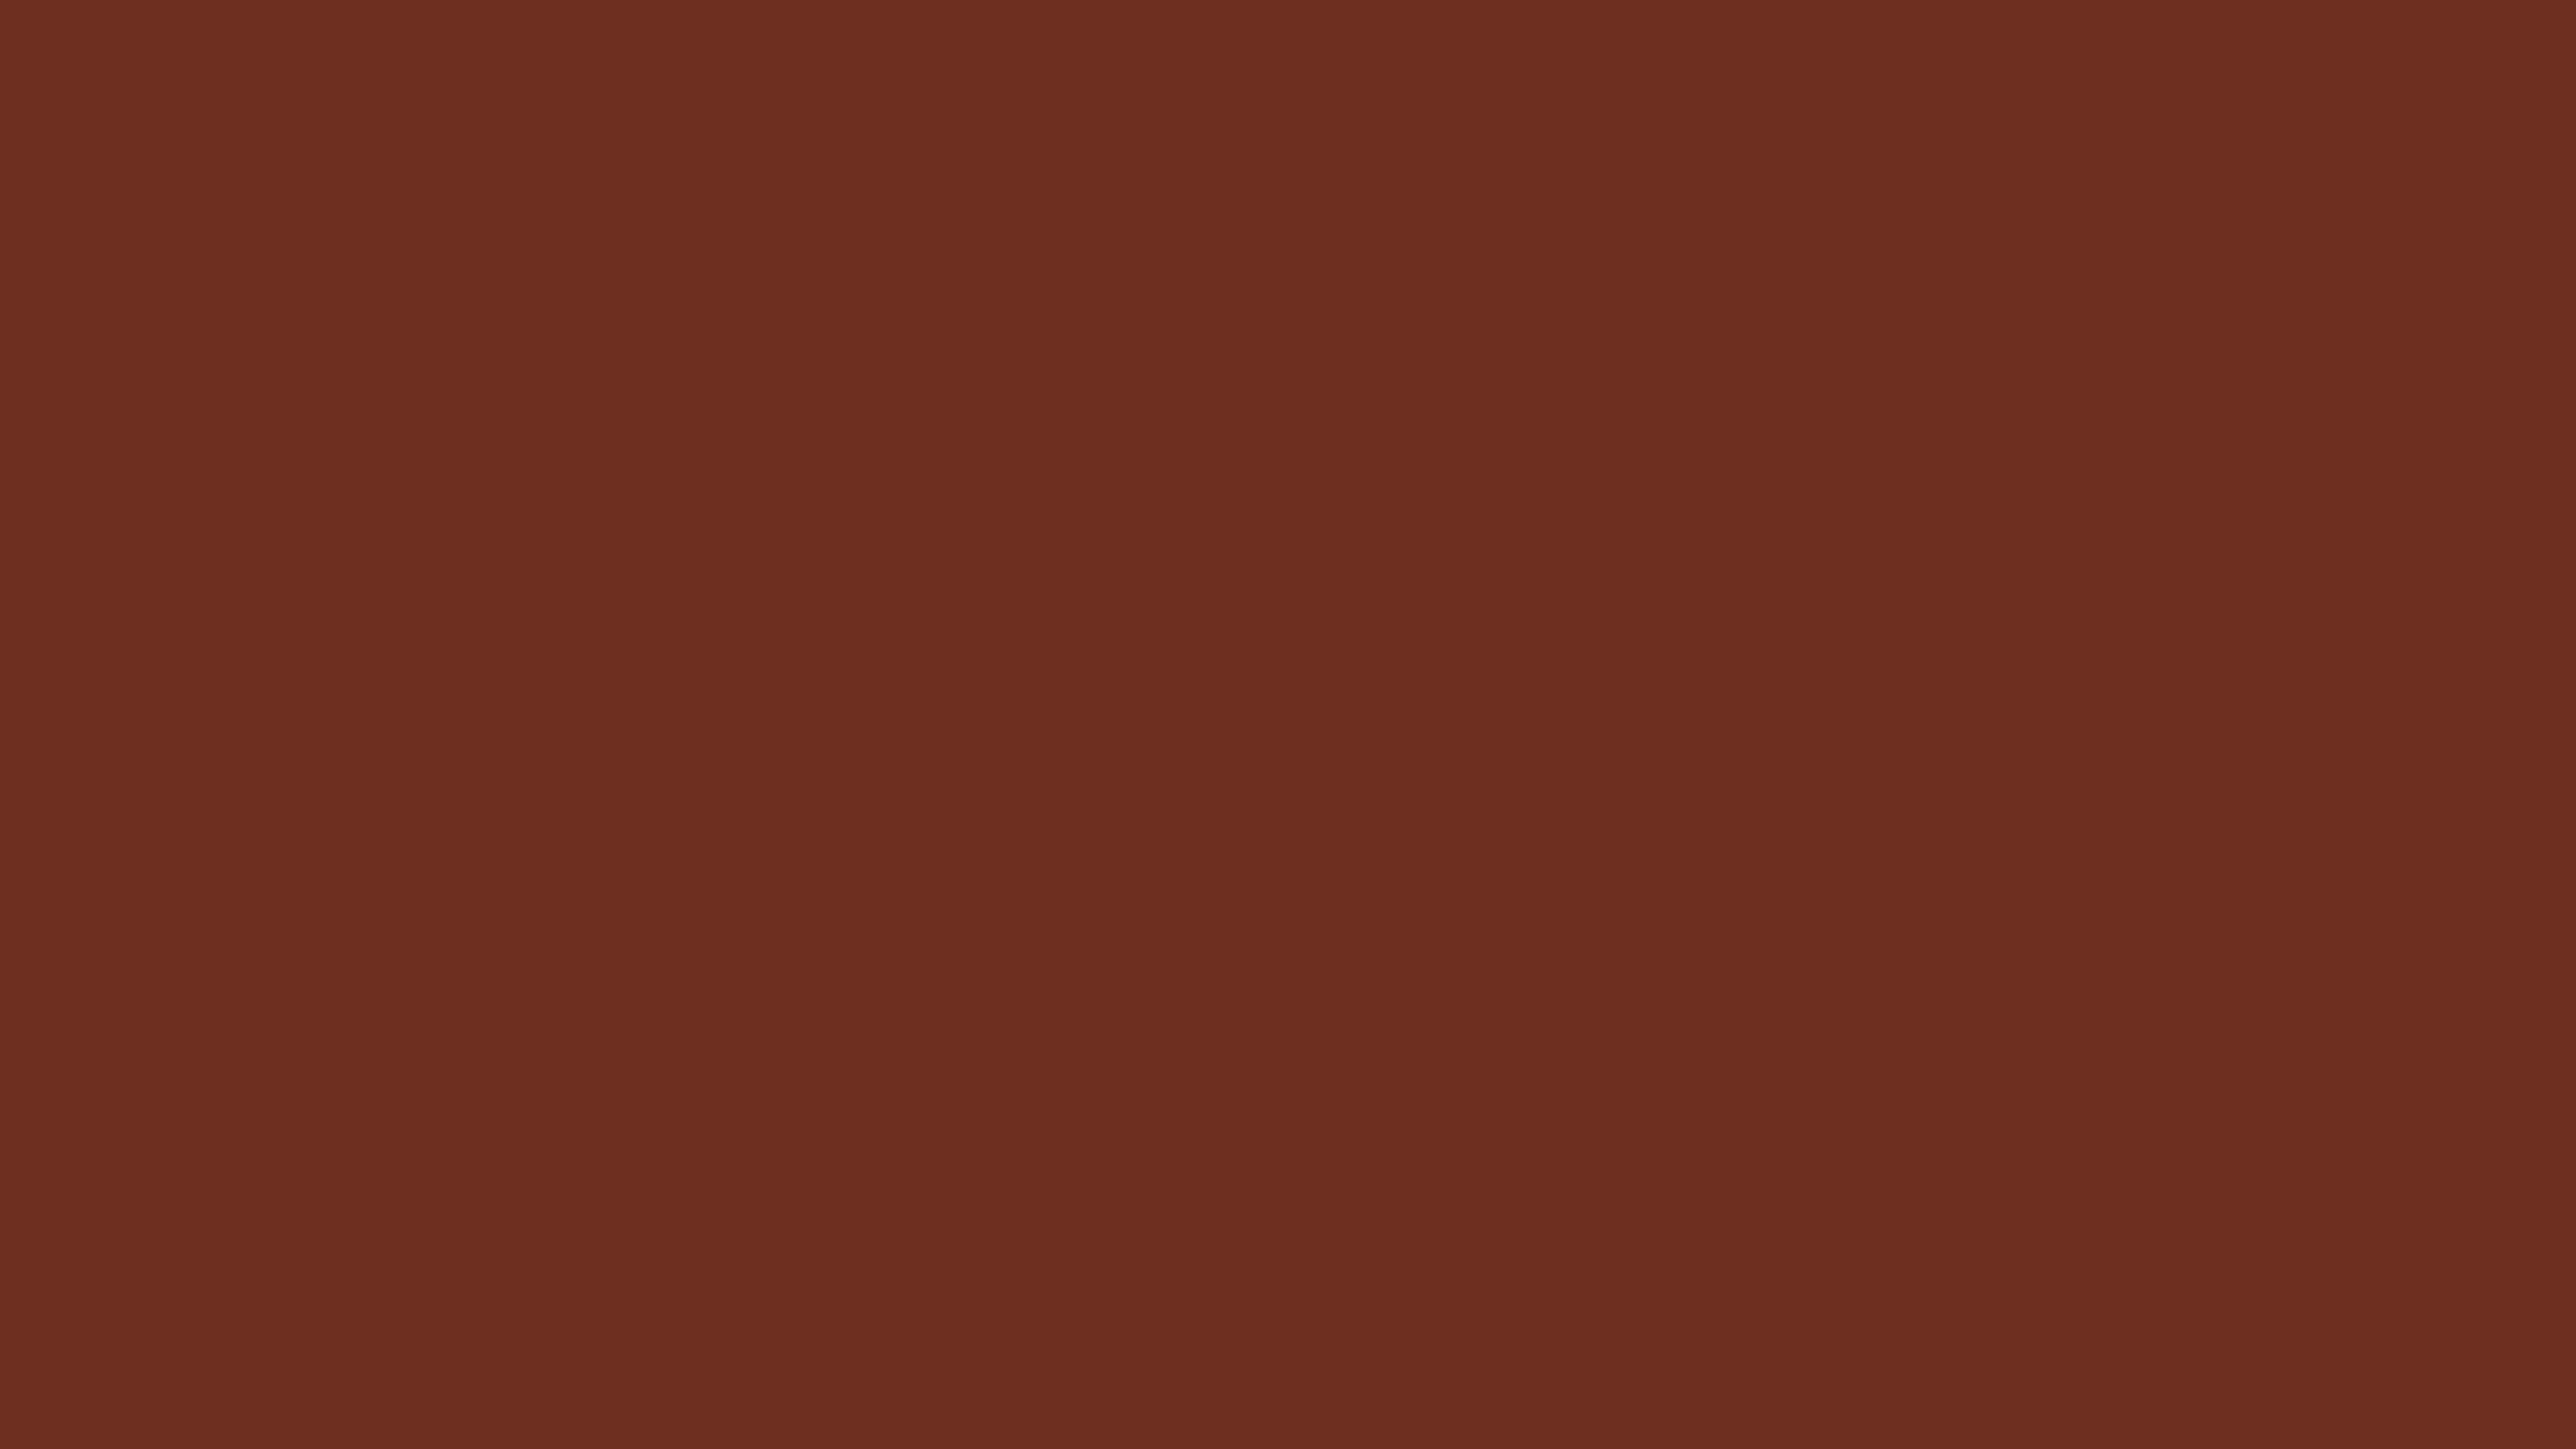 4096x2304 Liver Organ Solid Color Background